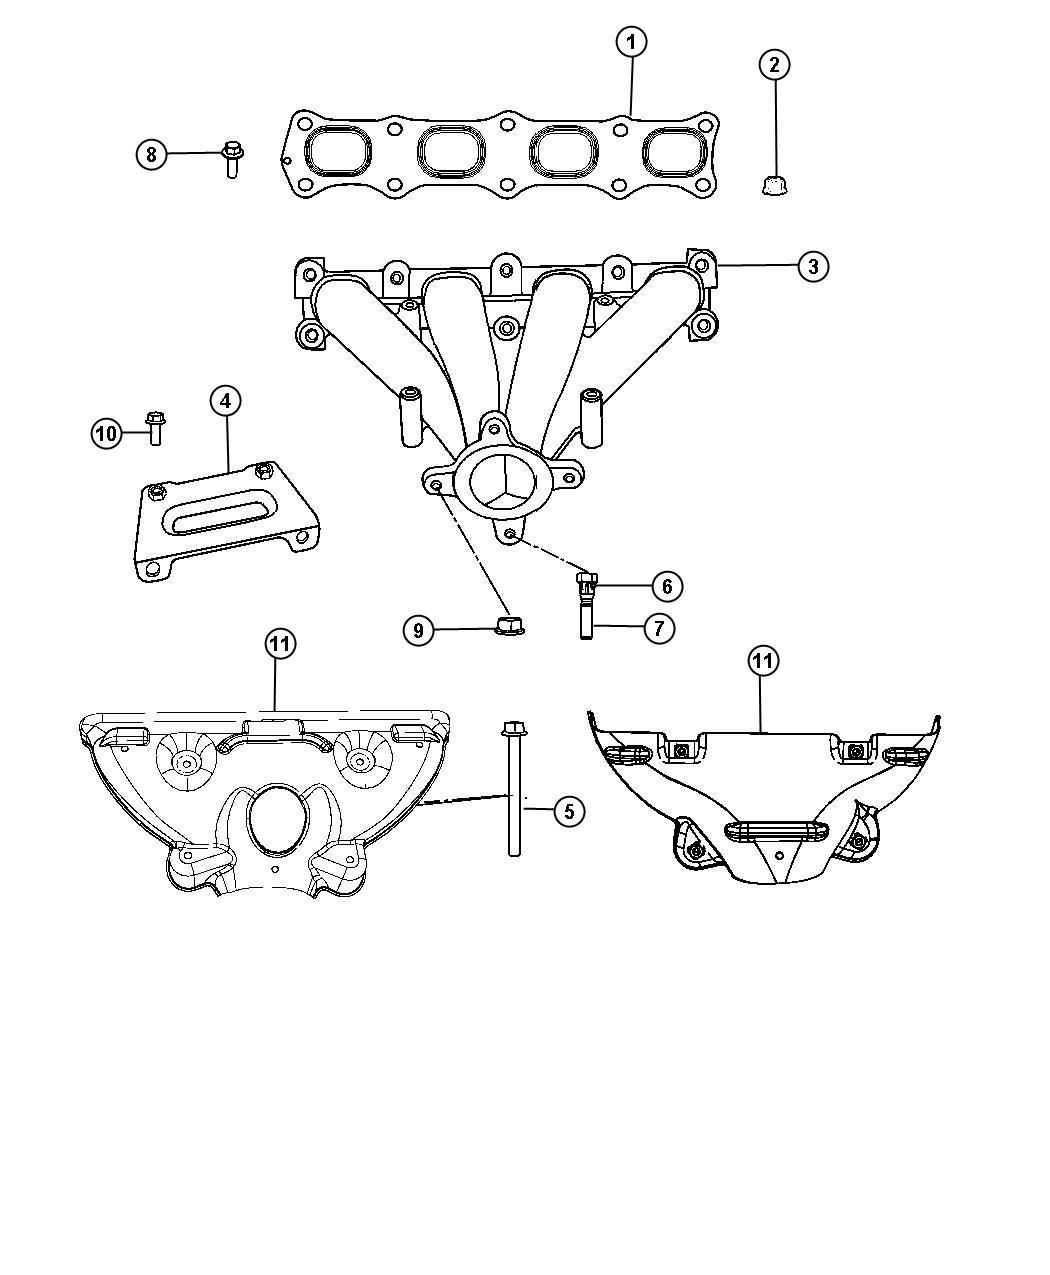 2010 Dodge Caliber Bolt. Hex flange head. M6x1.00x70.00